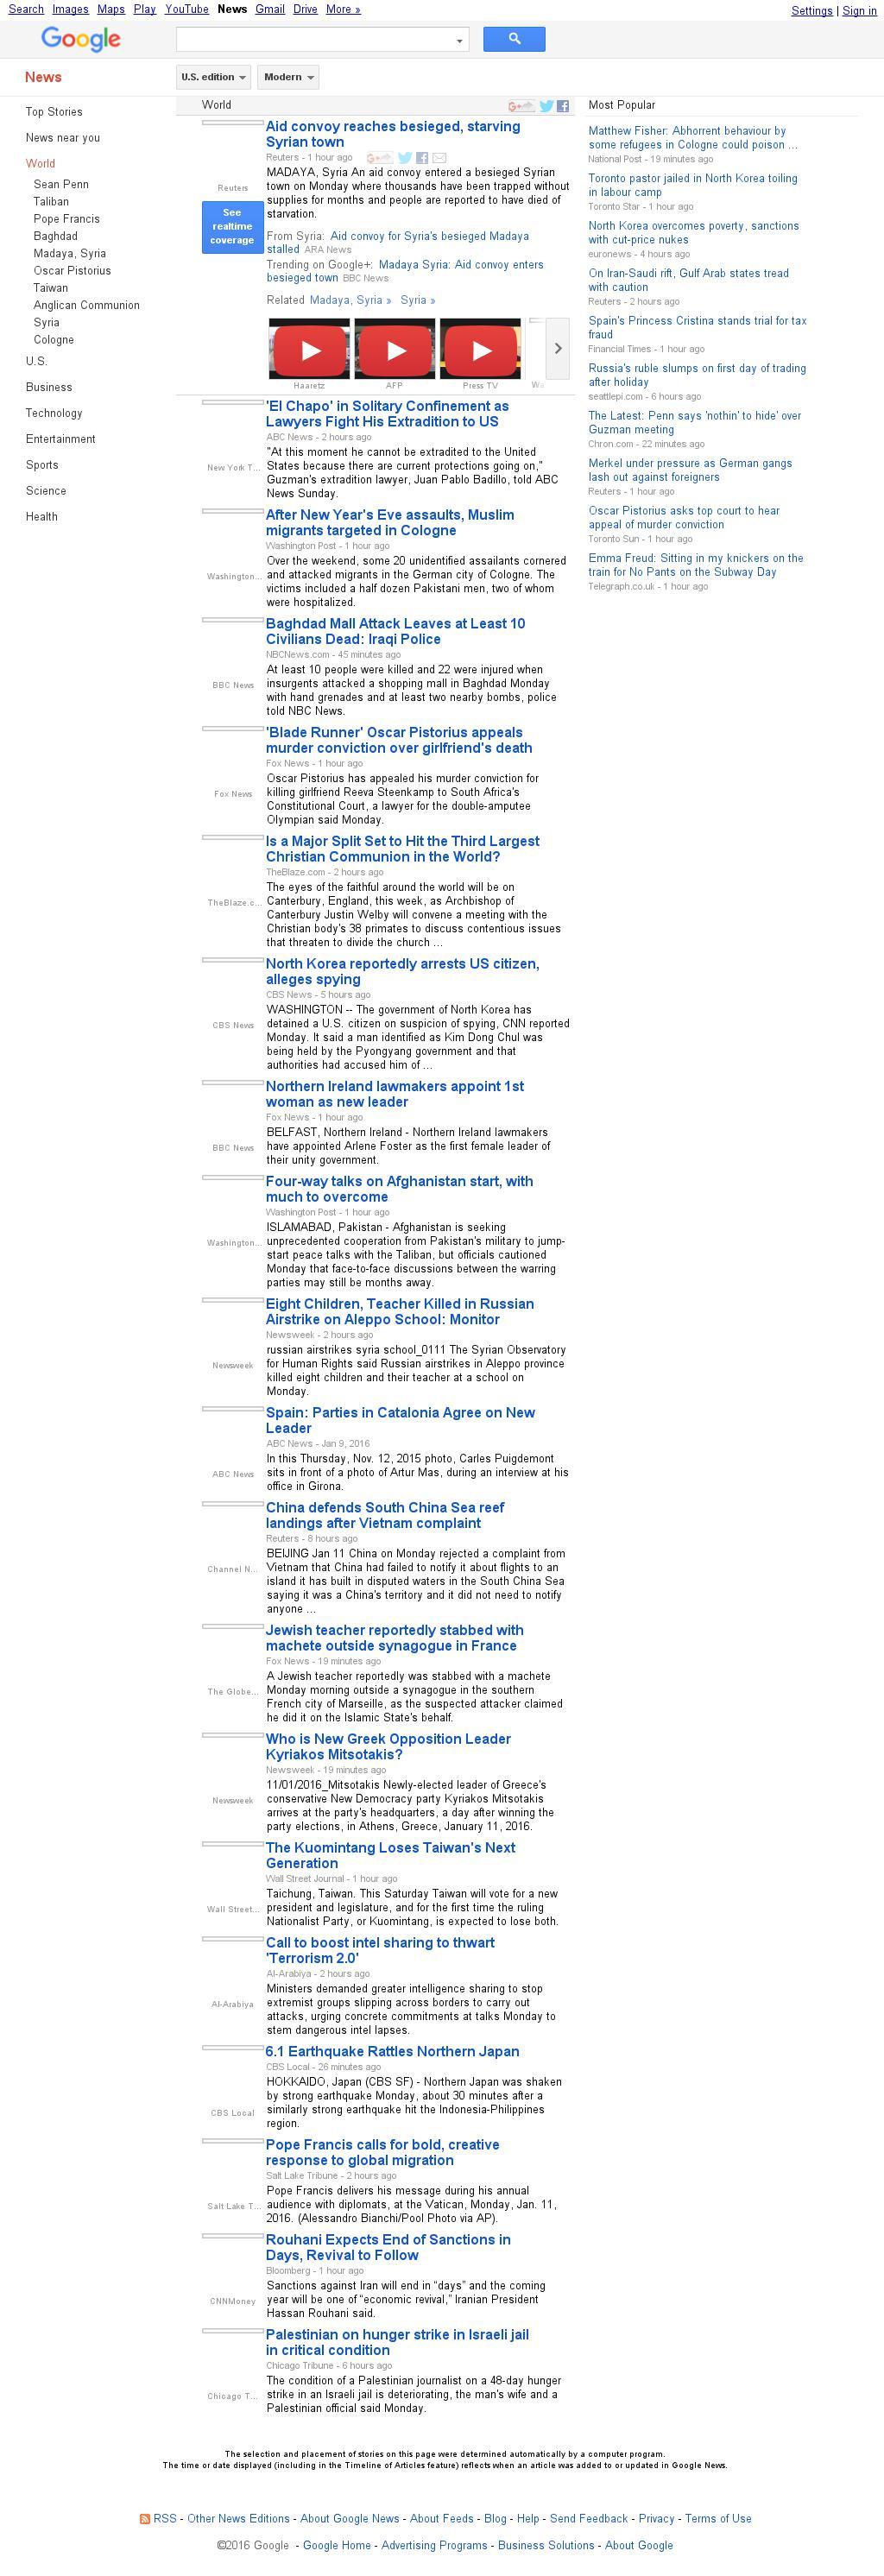 Google News: World at Monday Jan. 11, 2016, 7:09 p.m. UTC